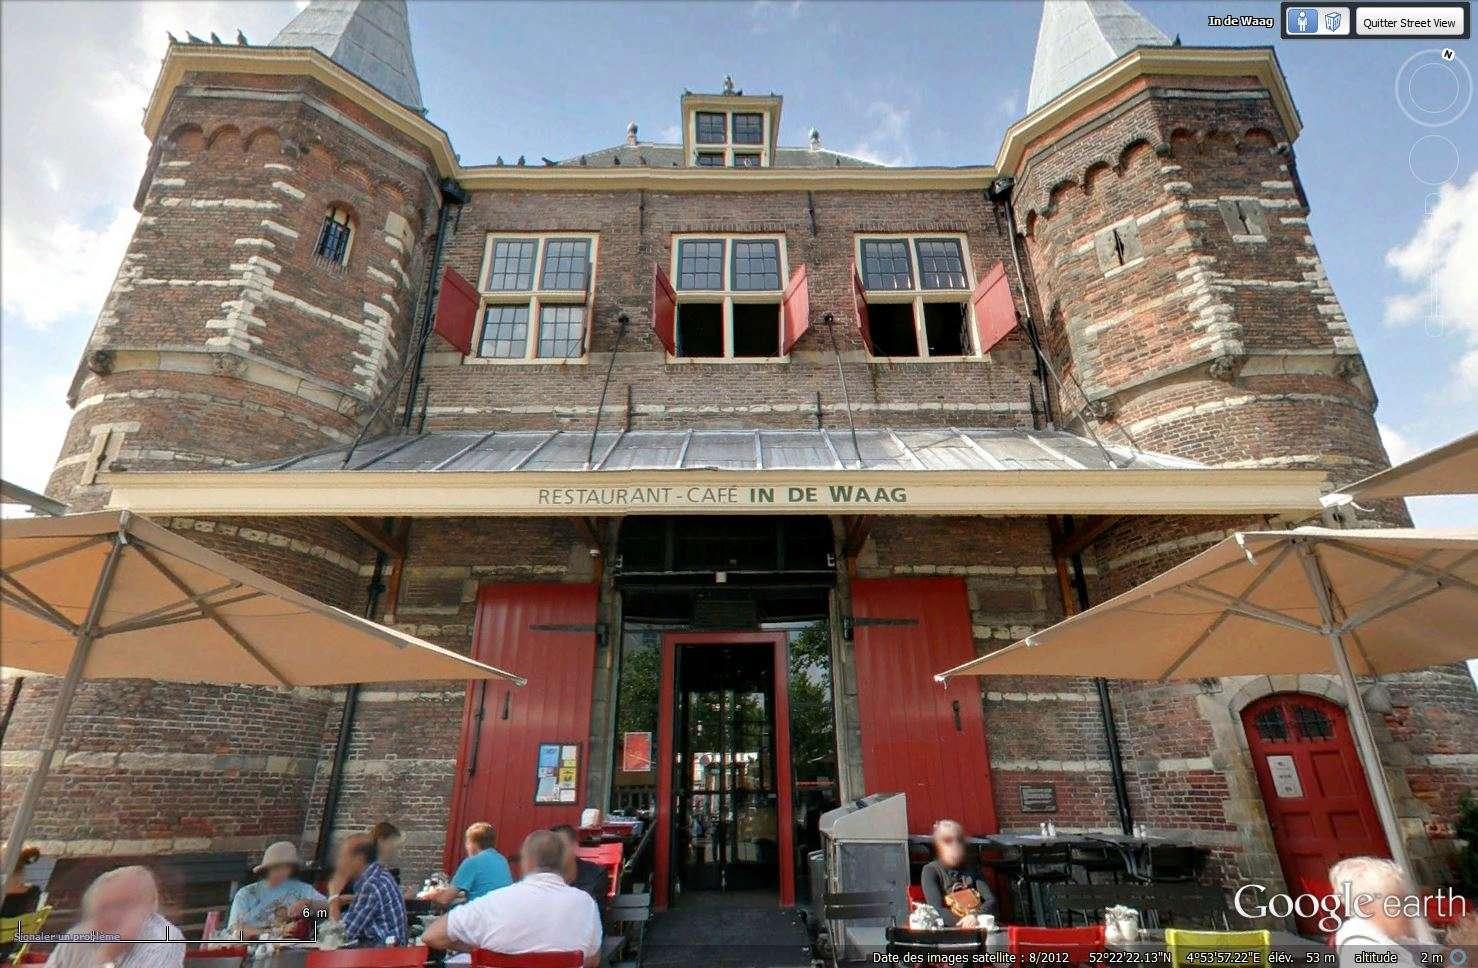 De Waag, Nieuwmarkt à Amsterdam, aux Pays-Bas. Tsge_239